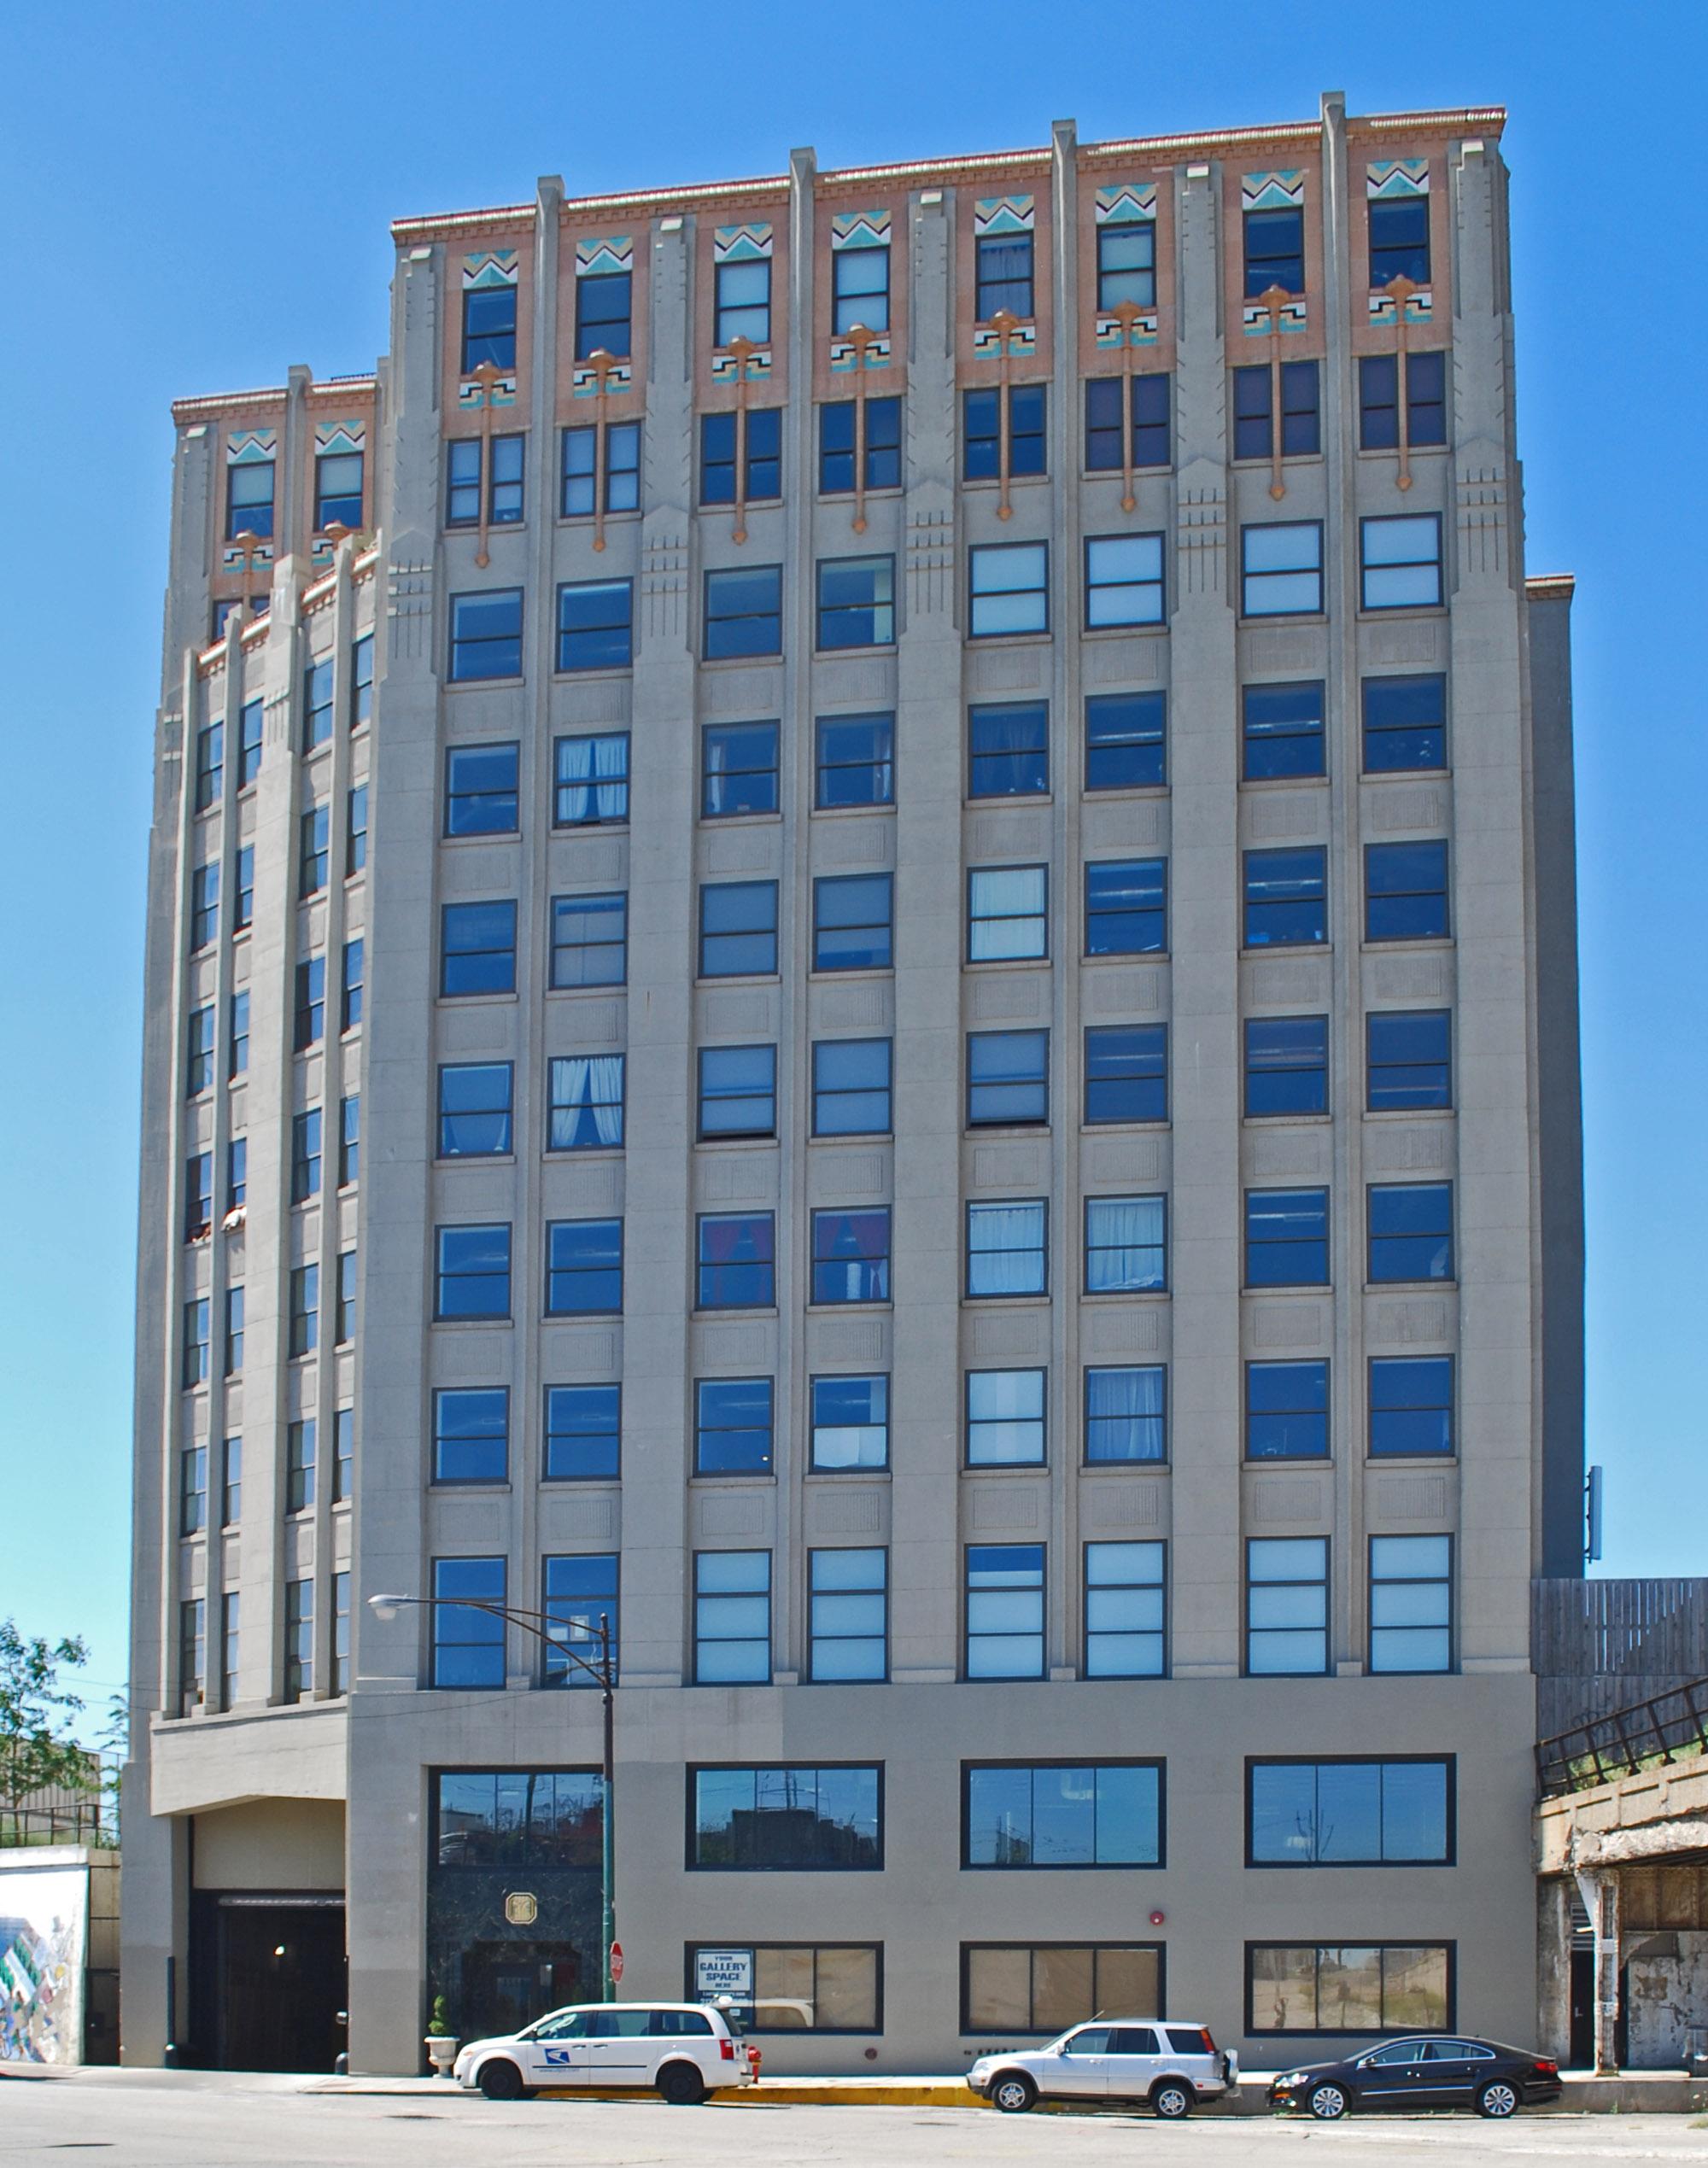 Storage Company Building